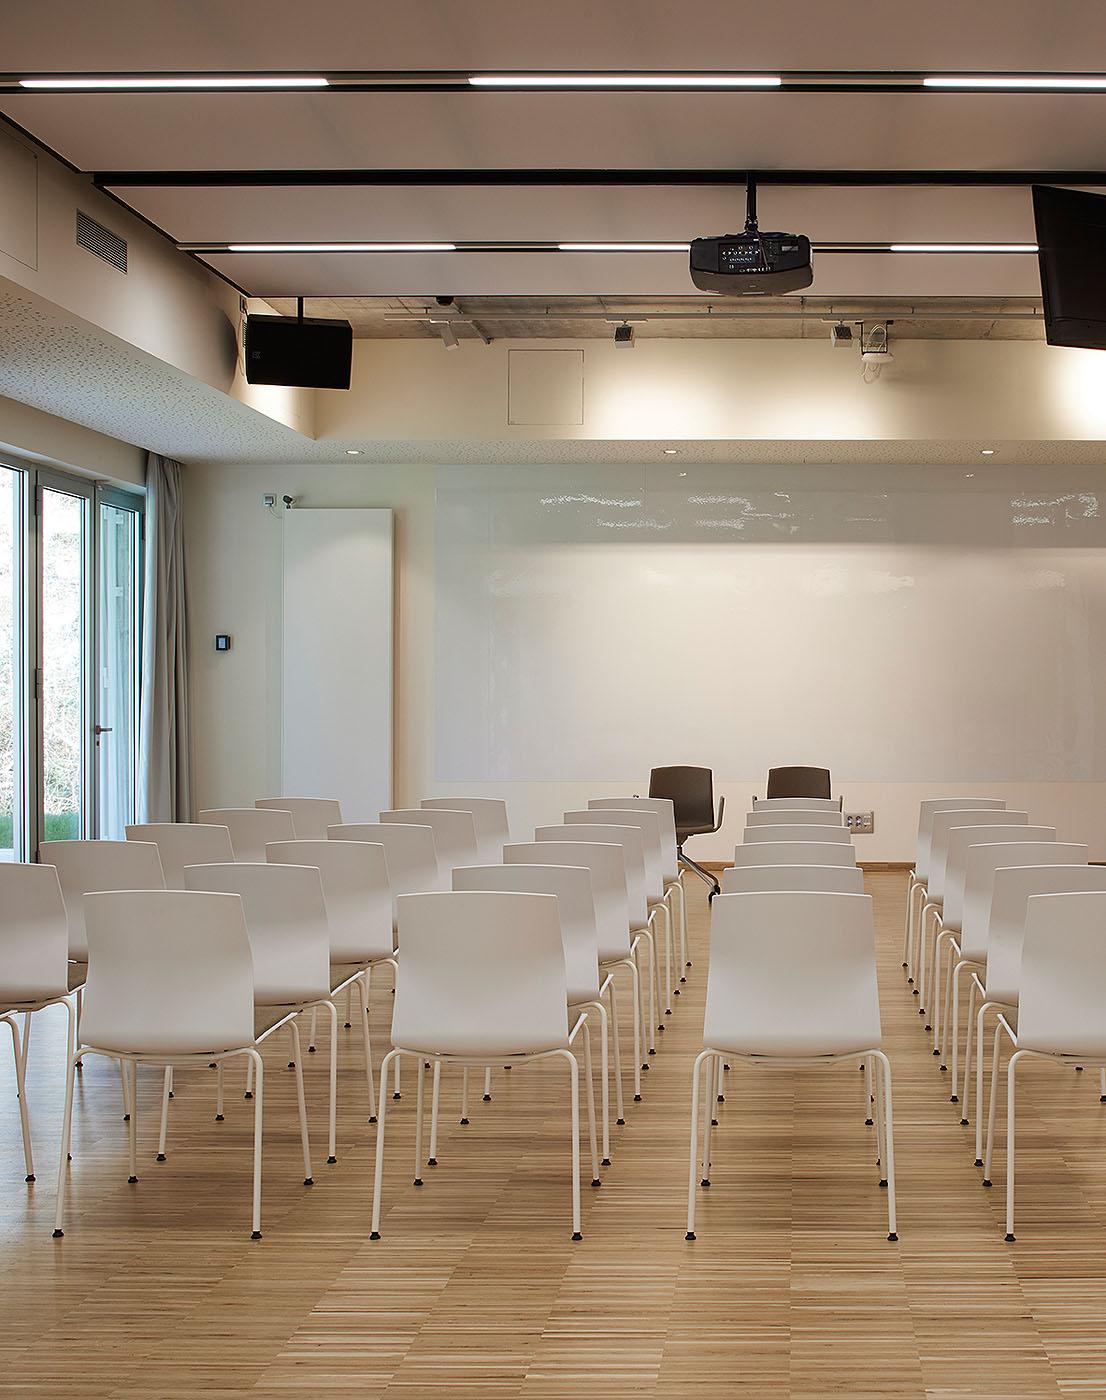 Universidad Huhazi por Akaba Design - Iñaki Caperochipi - Fotografía